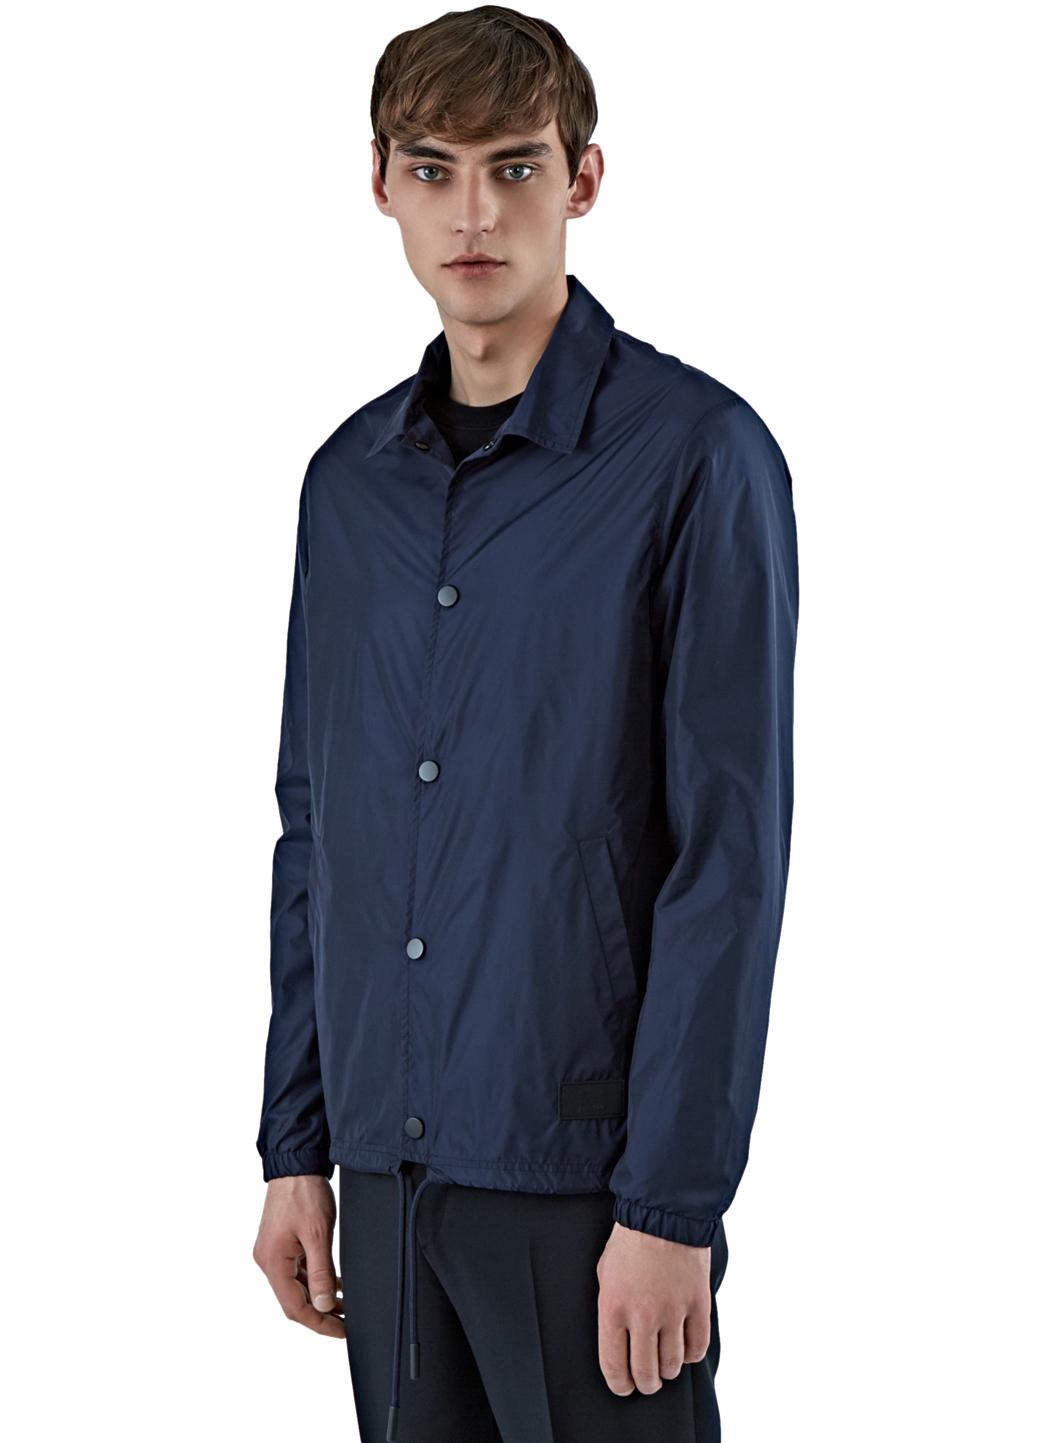 22cd53b7 Acne Studios Tony Face Coach Jacket in Blue for Men - Lyst